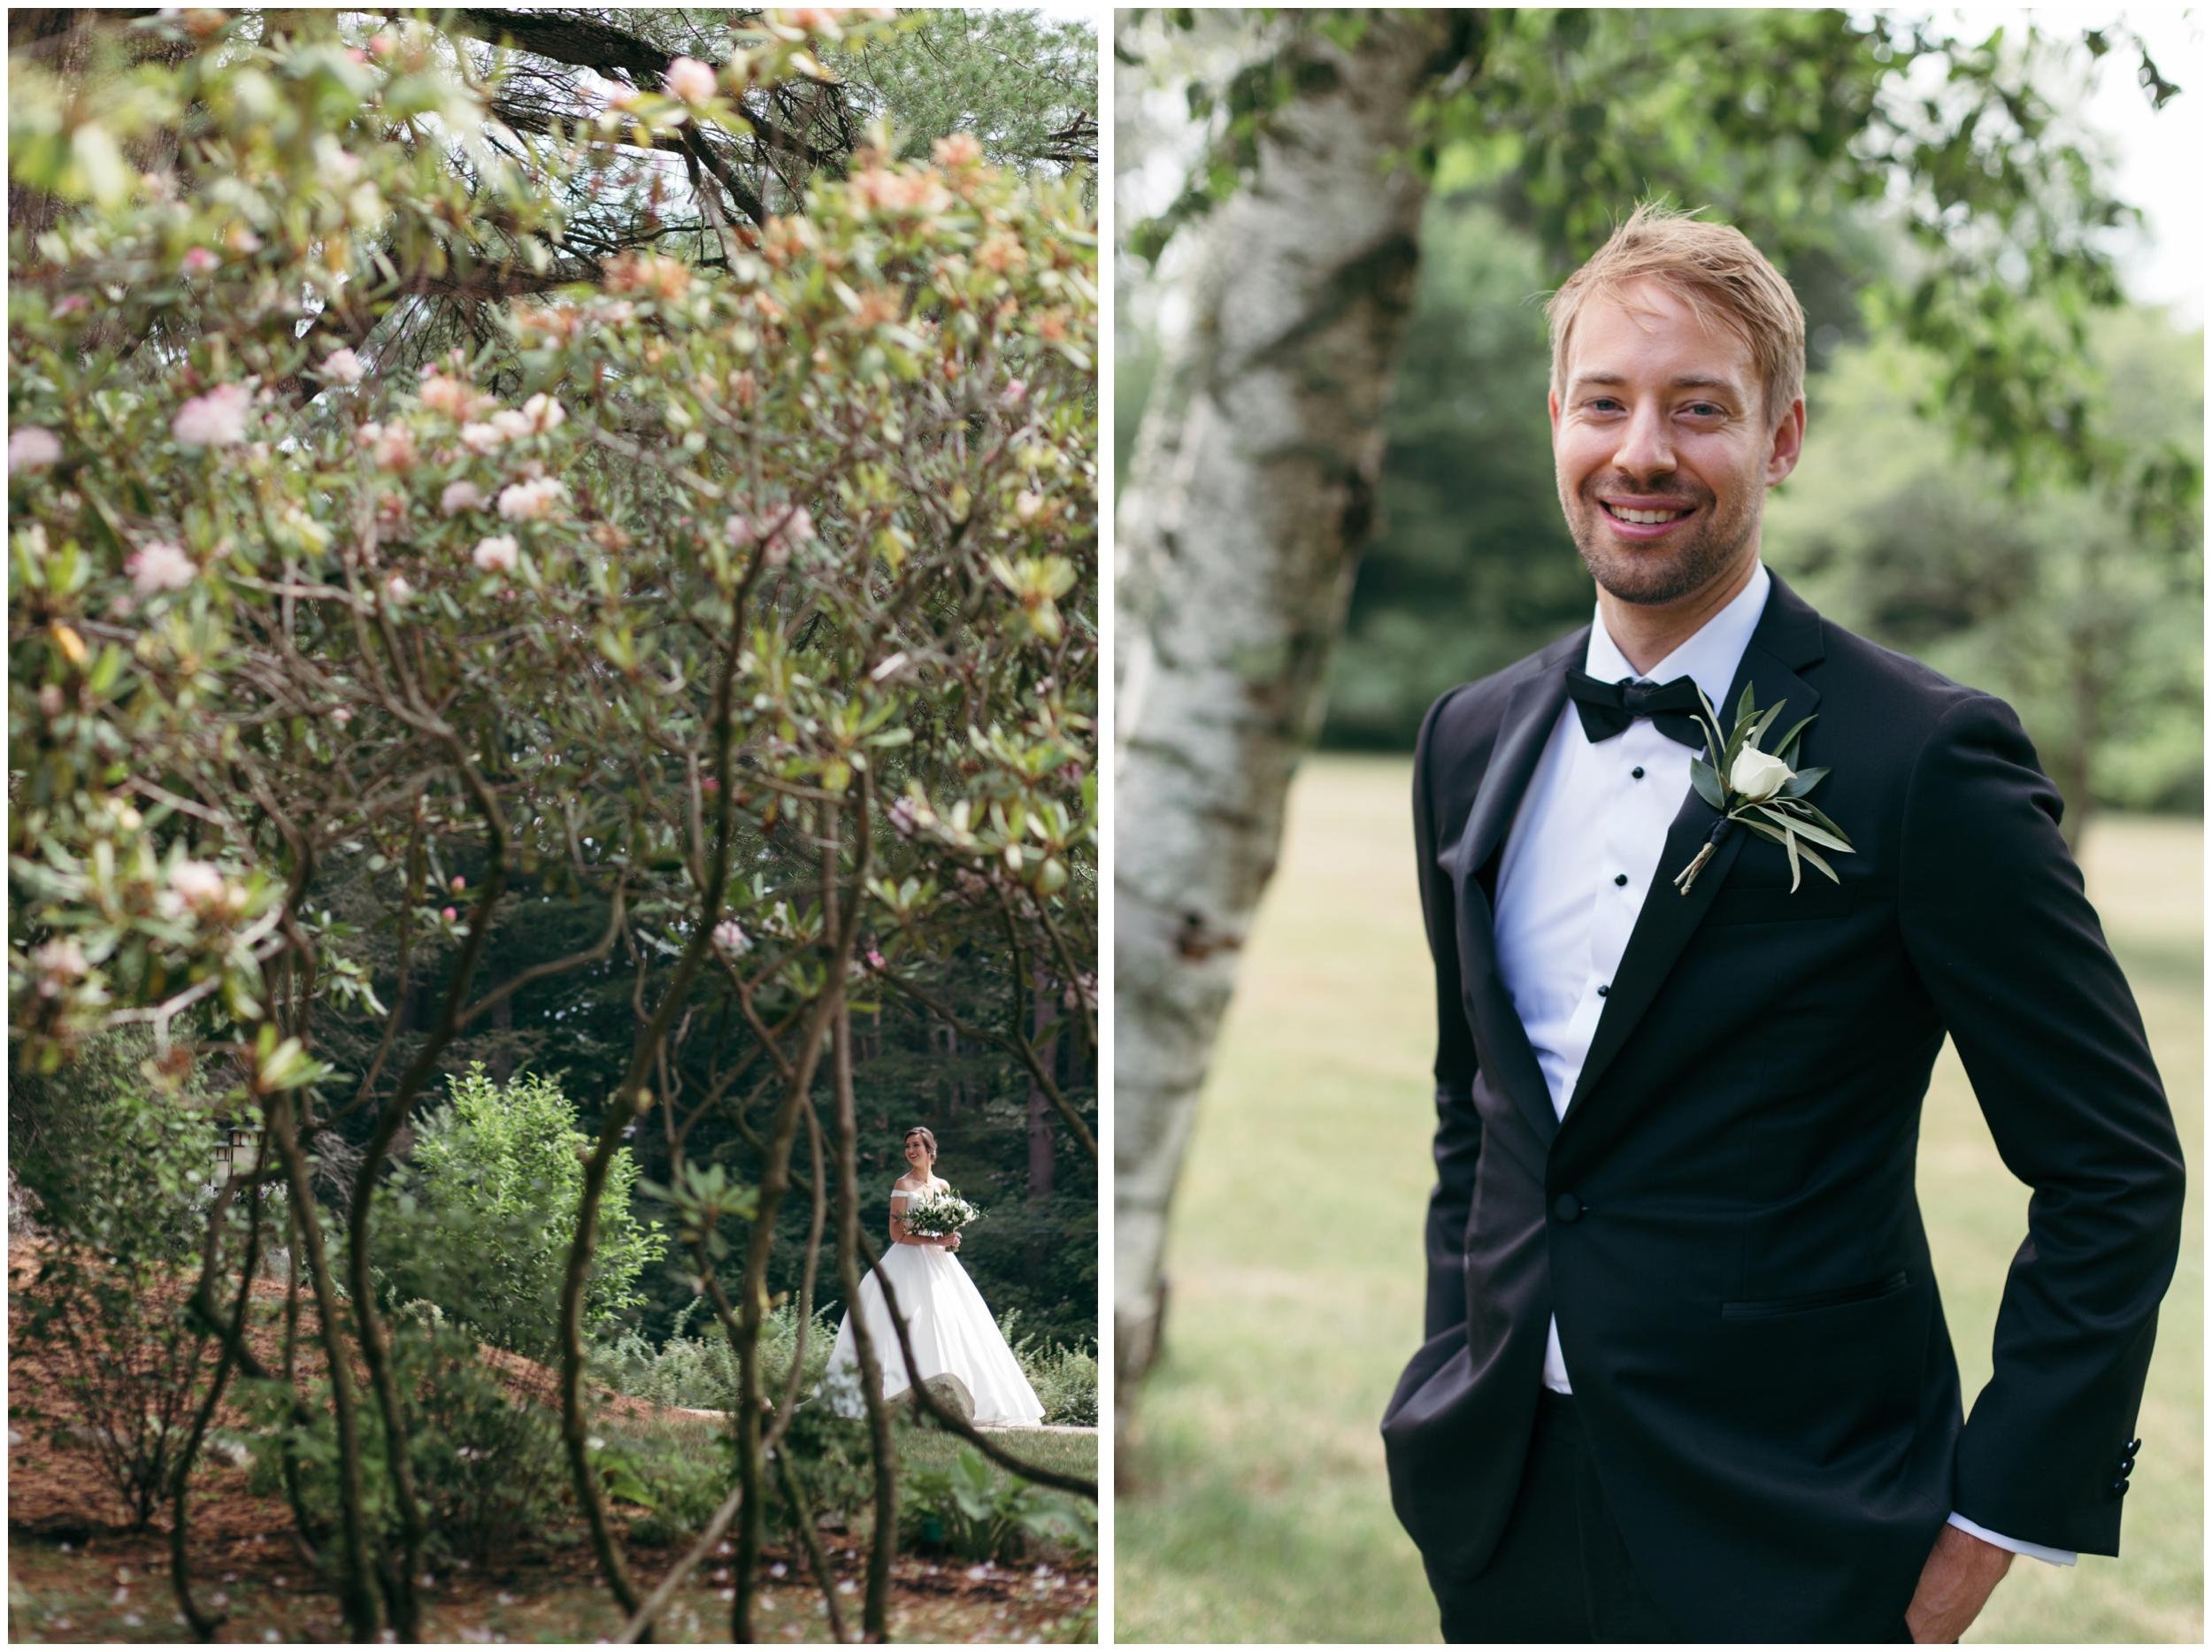 Willowdale-Estate-Wedding-Bailey-Q-Photo-Boston-Wedding-Photographer-008.JPG